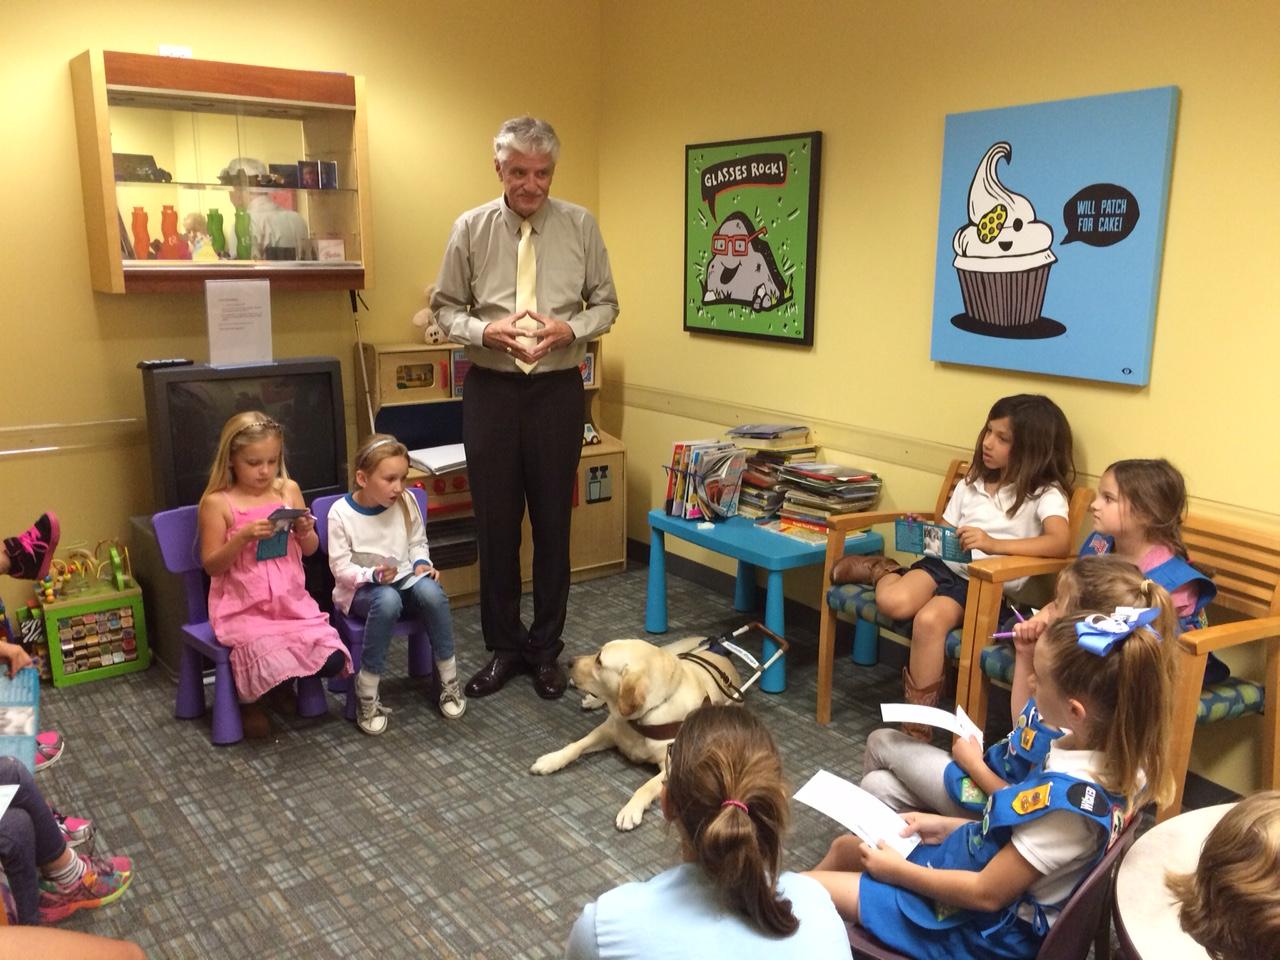 Wayne Heidle giving a childrens talk